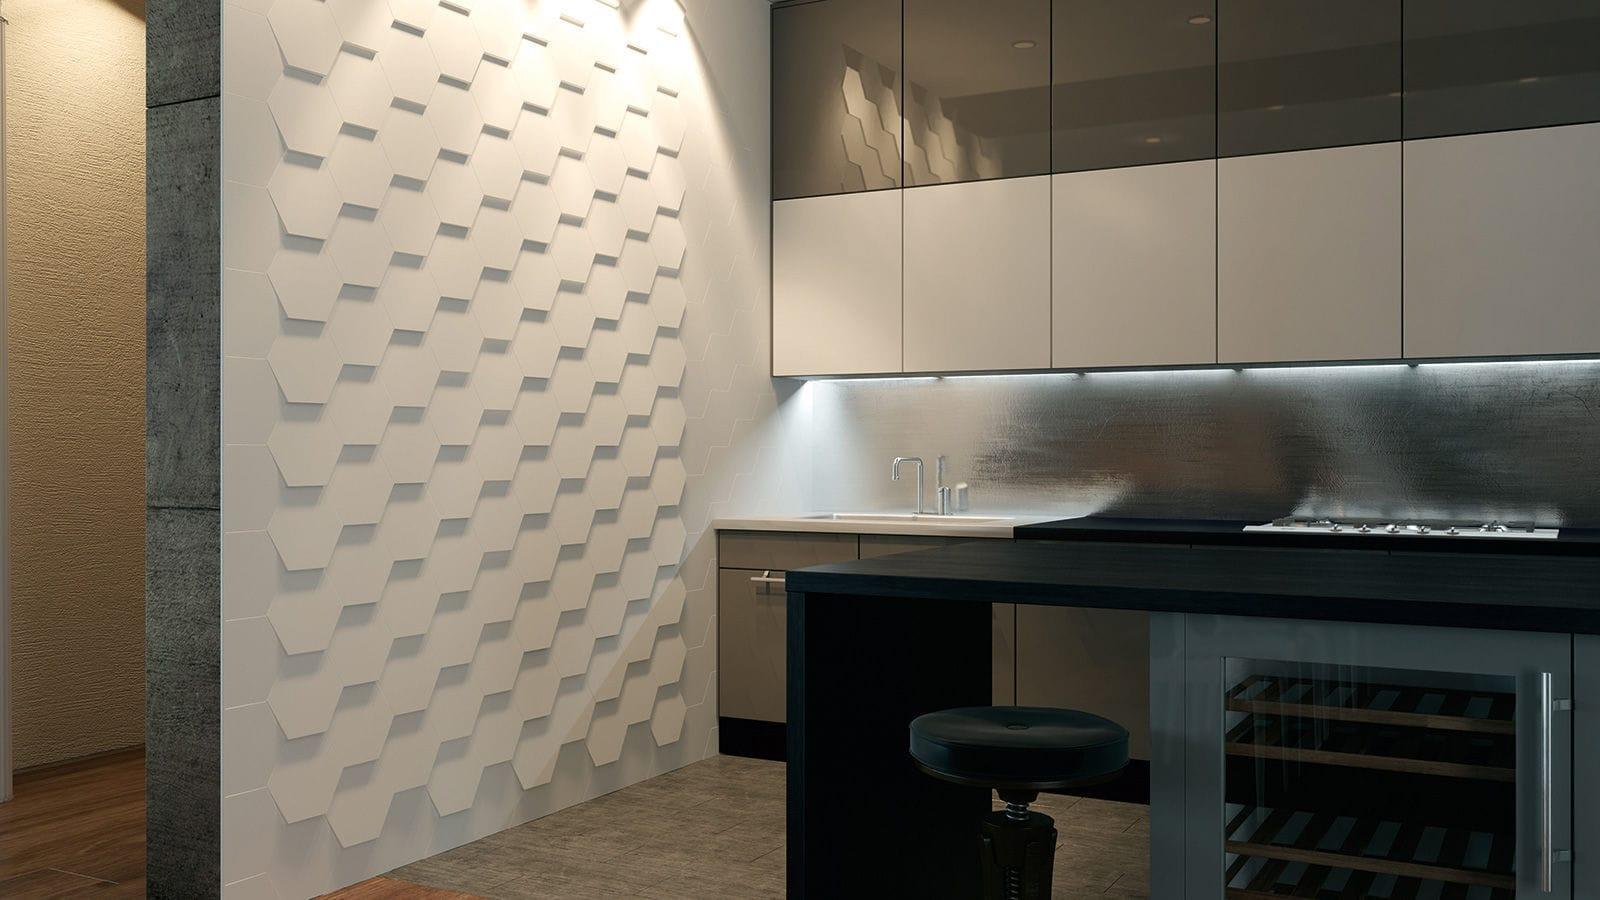 ... Bathroom Tile / Wall / Ceramic / Textured HEXA WOW Design EU ...